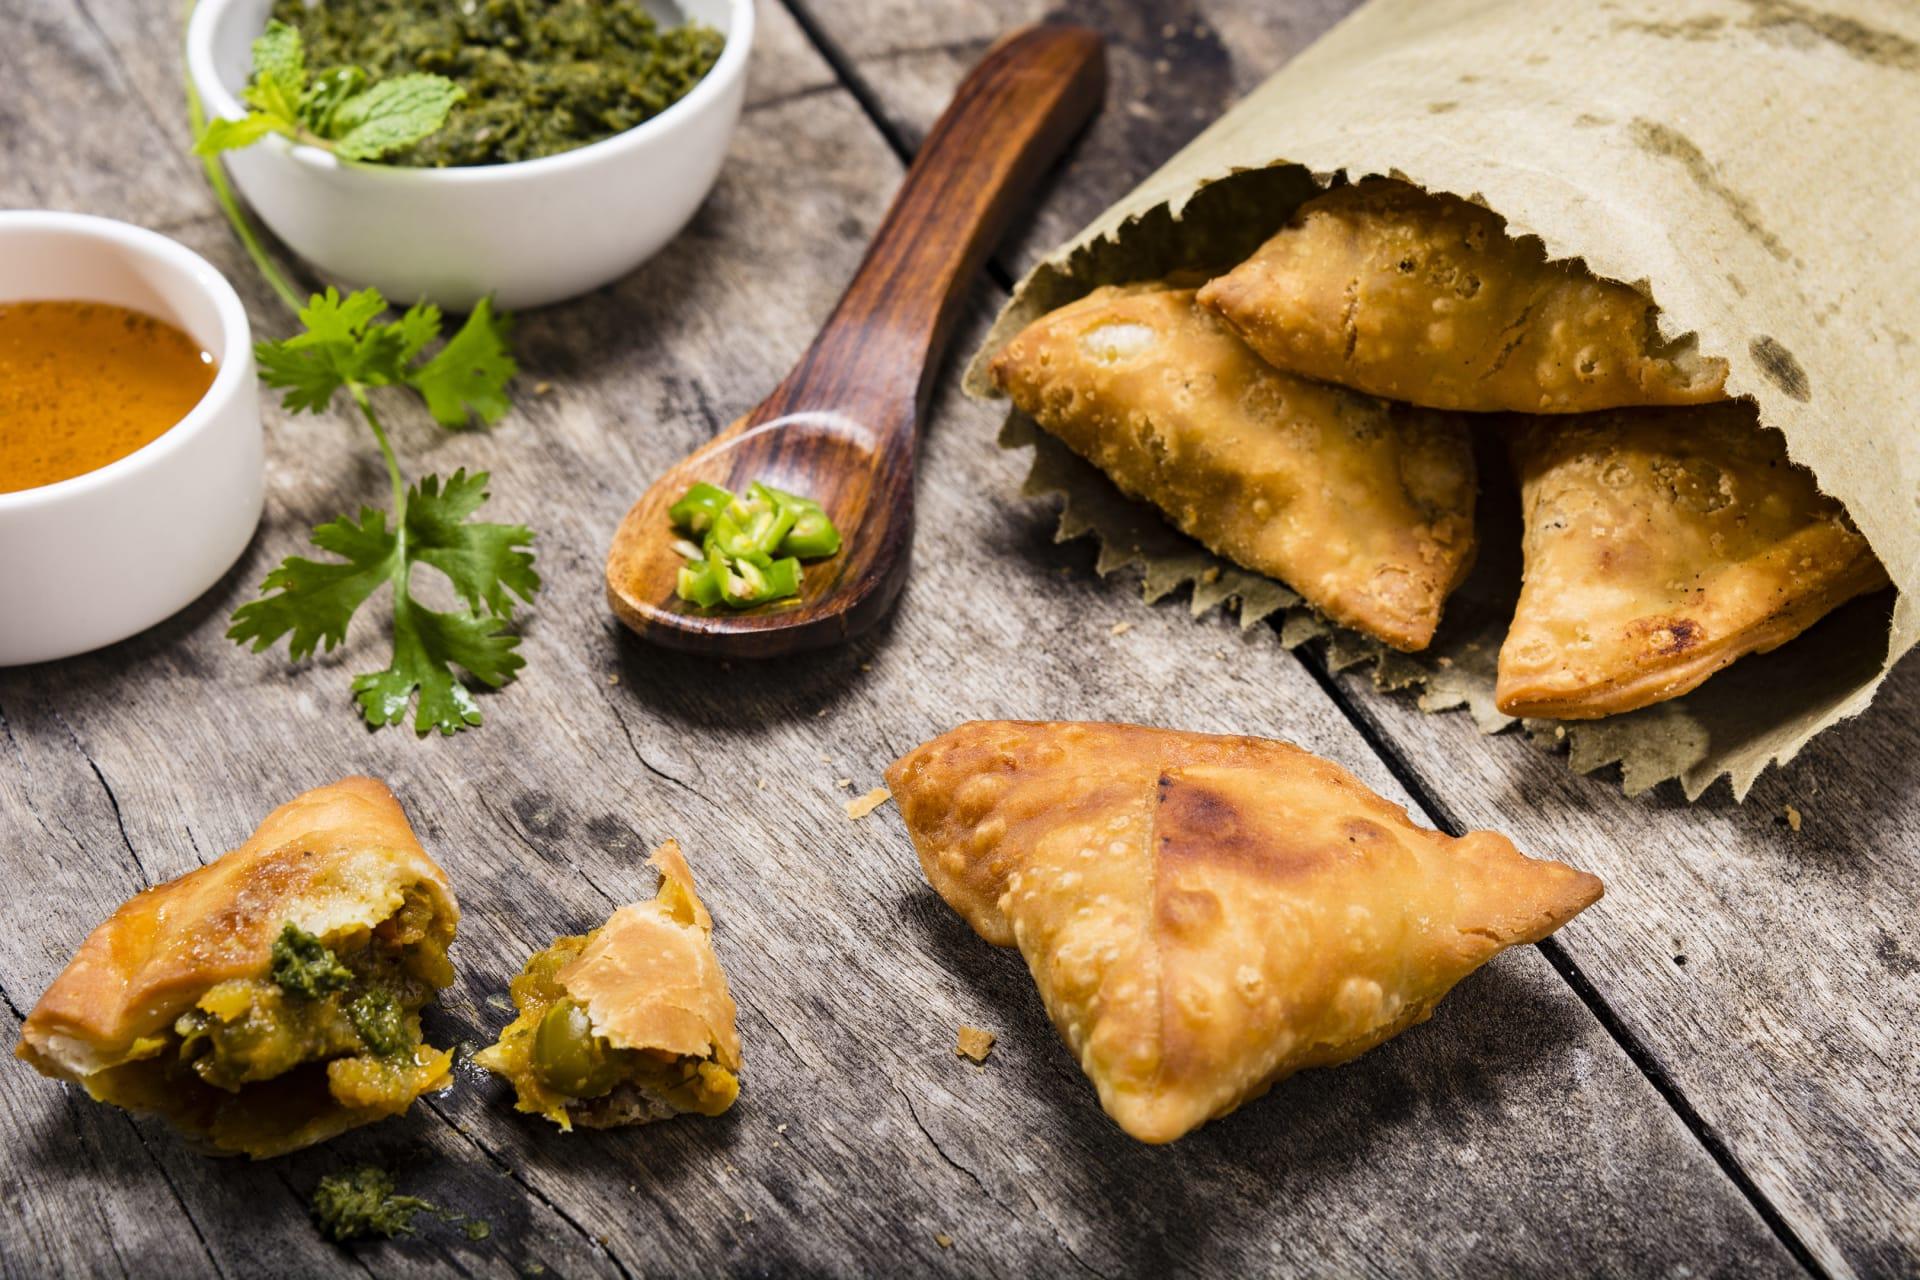 Jaipur - Samosas - The Popular Indian Snack